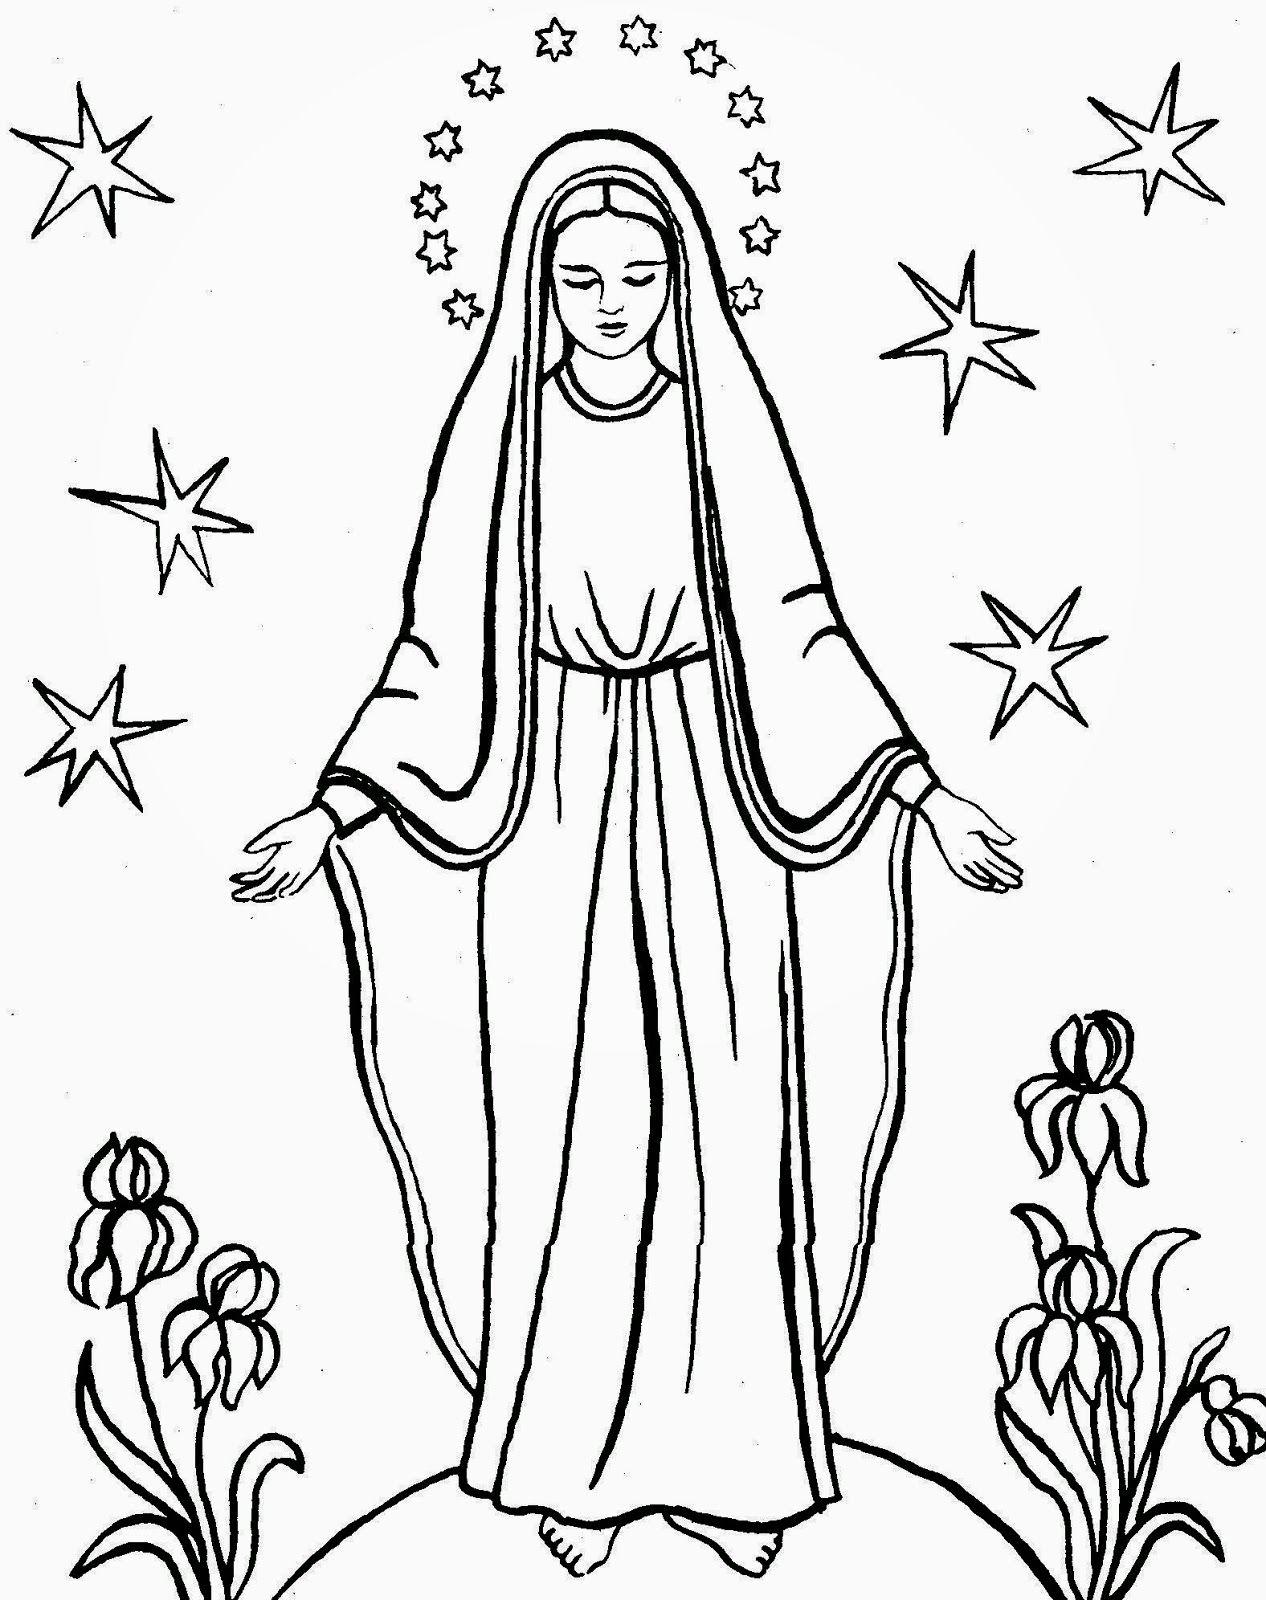 Np Maryja Kolorowanka 15 Jpg 1266 1600 Bible Coloring Pages Catholic Folk Art Bible Coloring